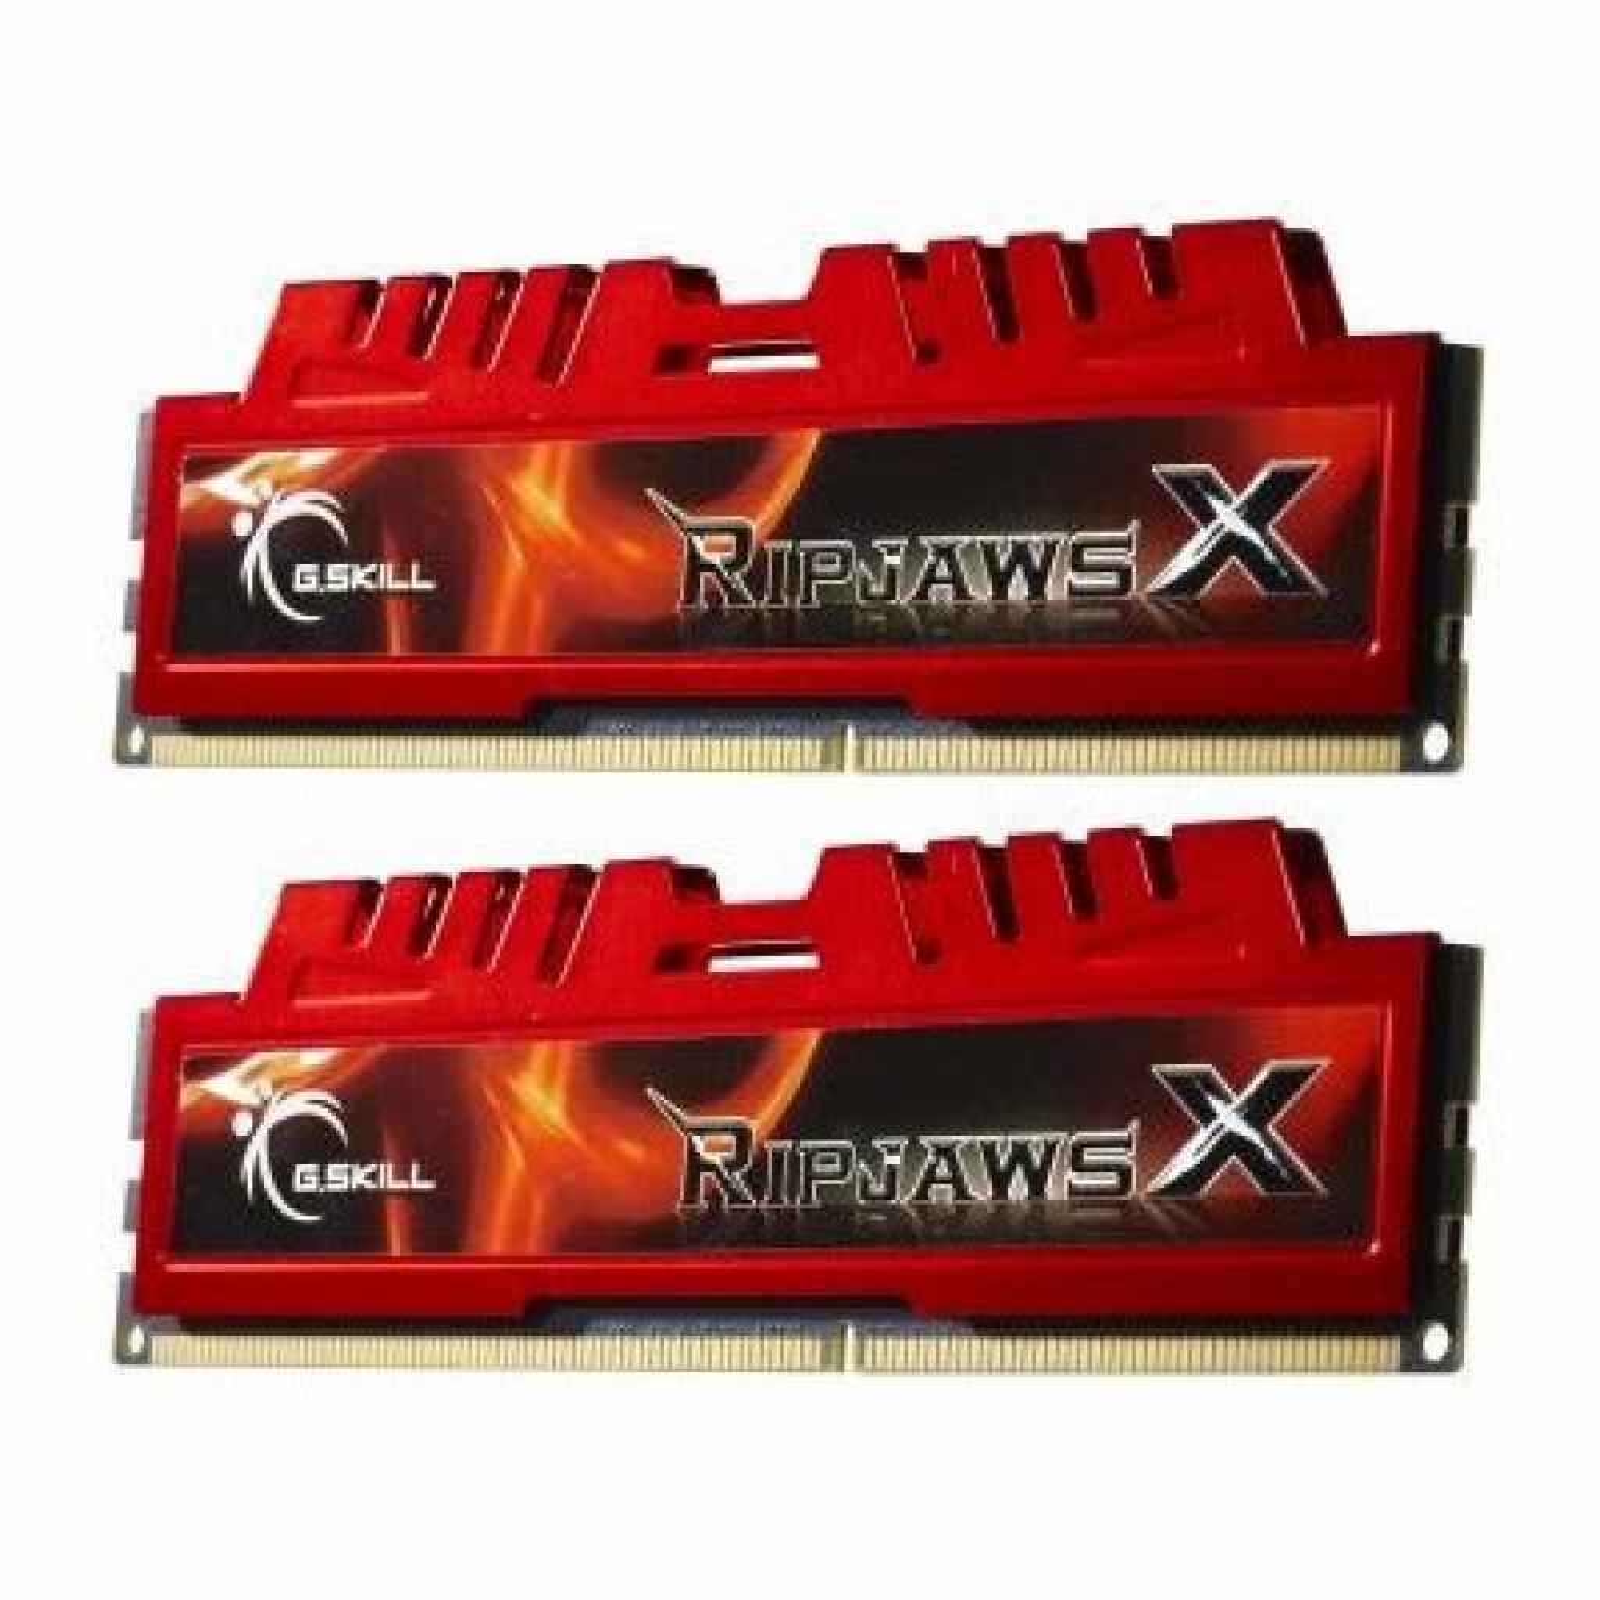 Модуль памяти для компьютера DDR3 4GB (2x2GB) 1333 MHz G.Skill (F3-10666CL9D-4GBXL)